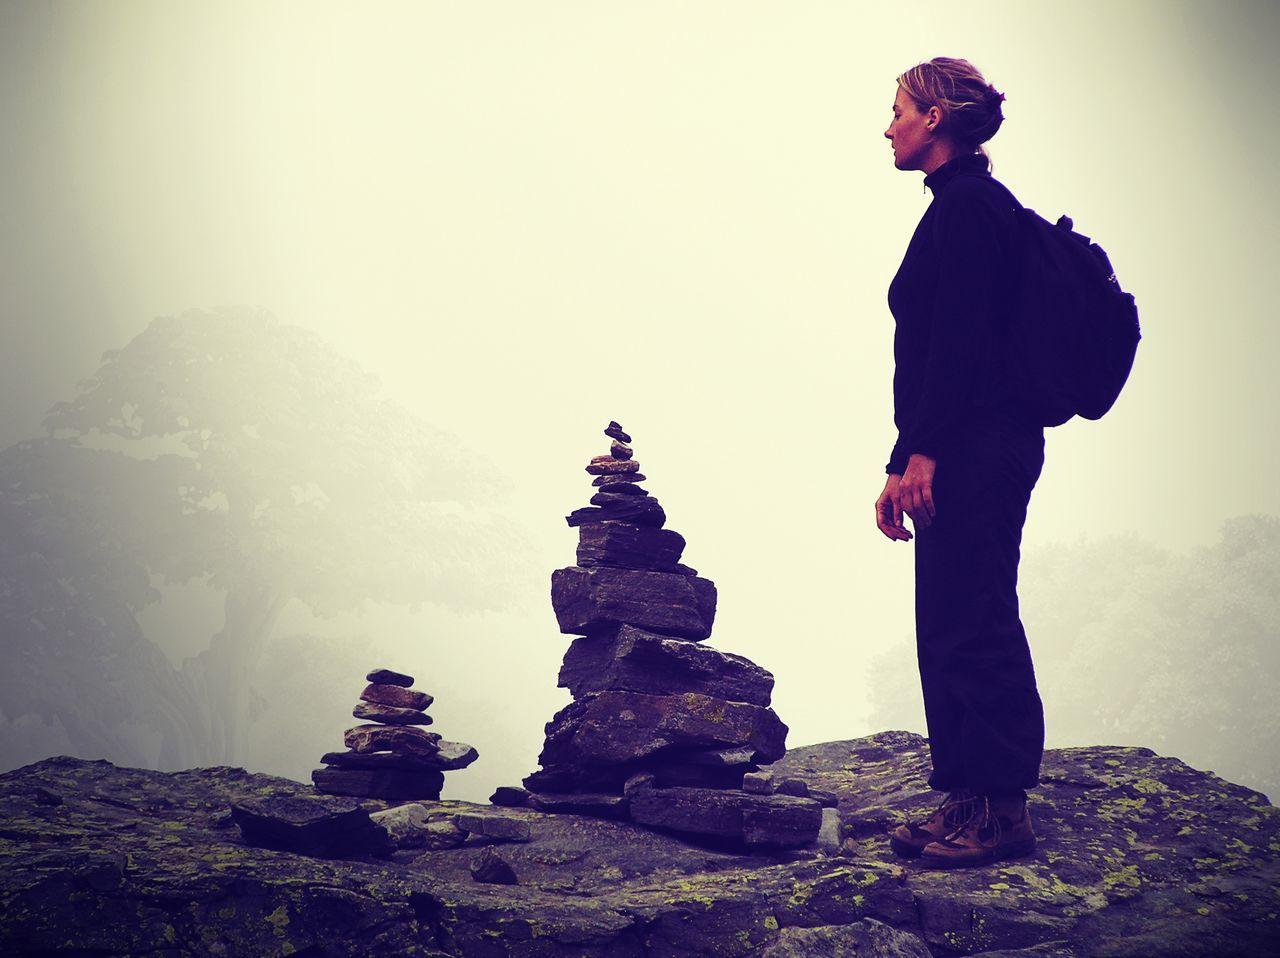 Full Length Girl Inukshuk Landscape Mountain One Person Outdoors Quiet Moments Rock - Object Scenics Sentry Serenity Standing Trekking Zen Zen-like